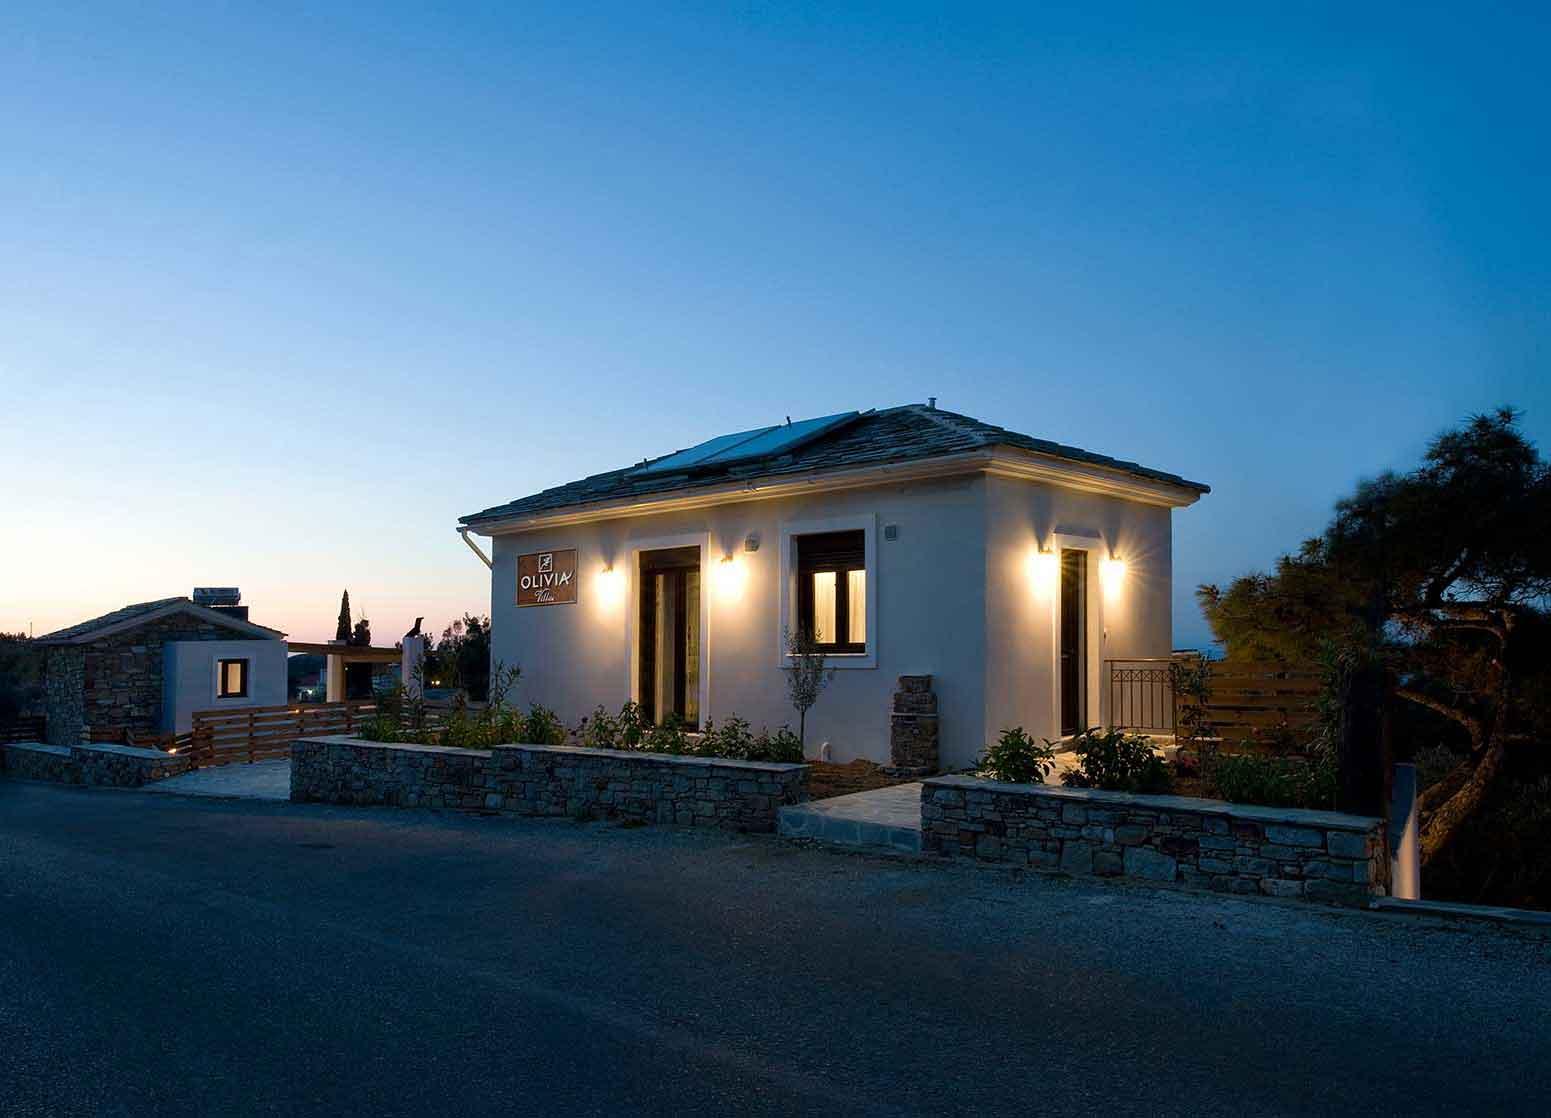 ikaria olivia villas street view